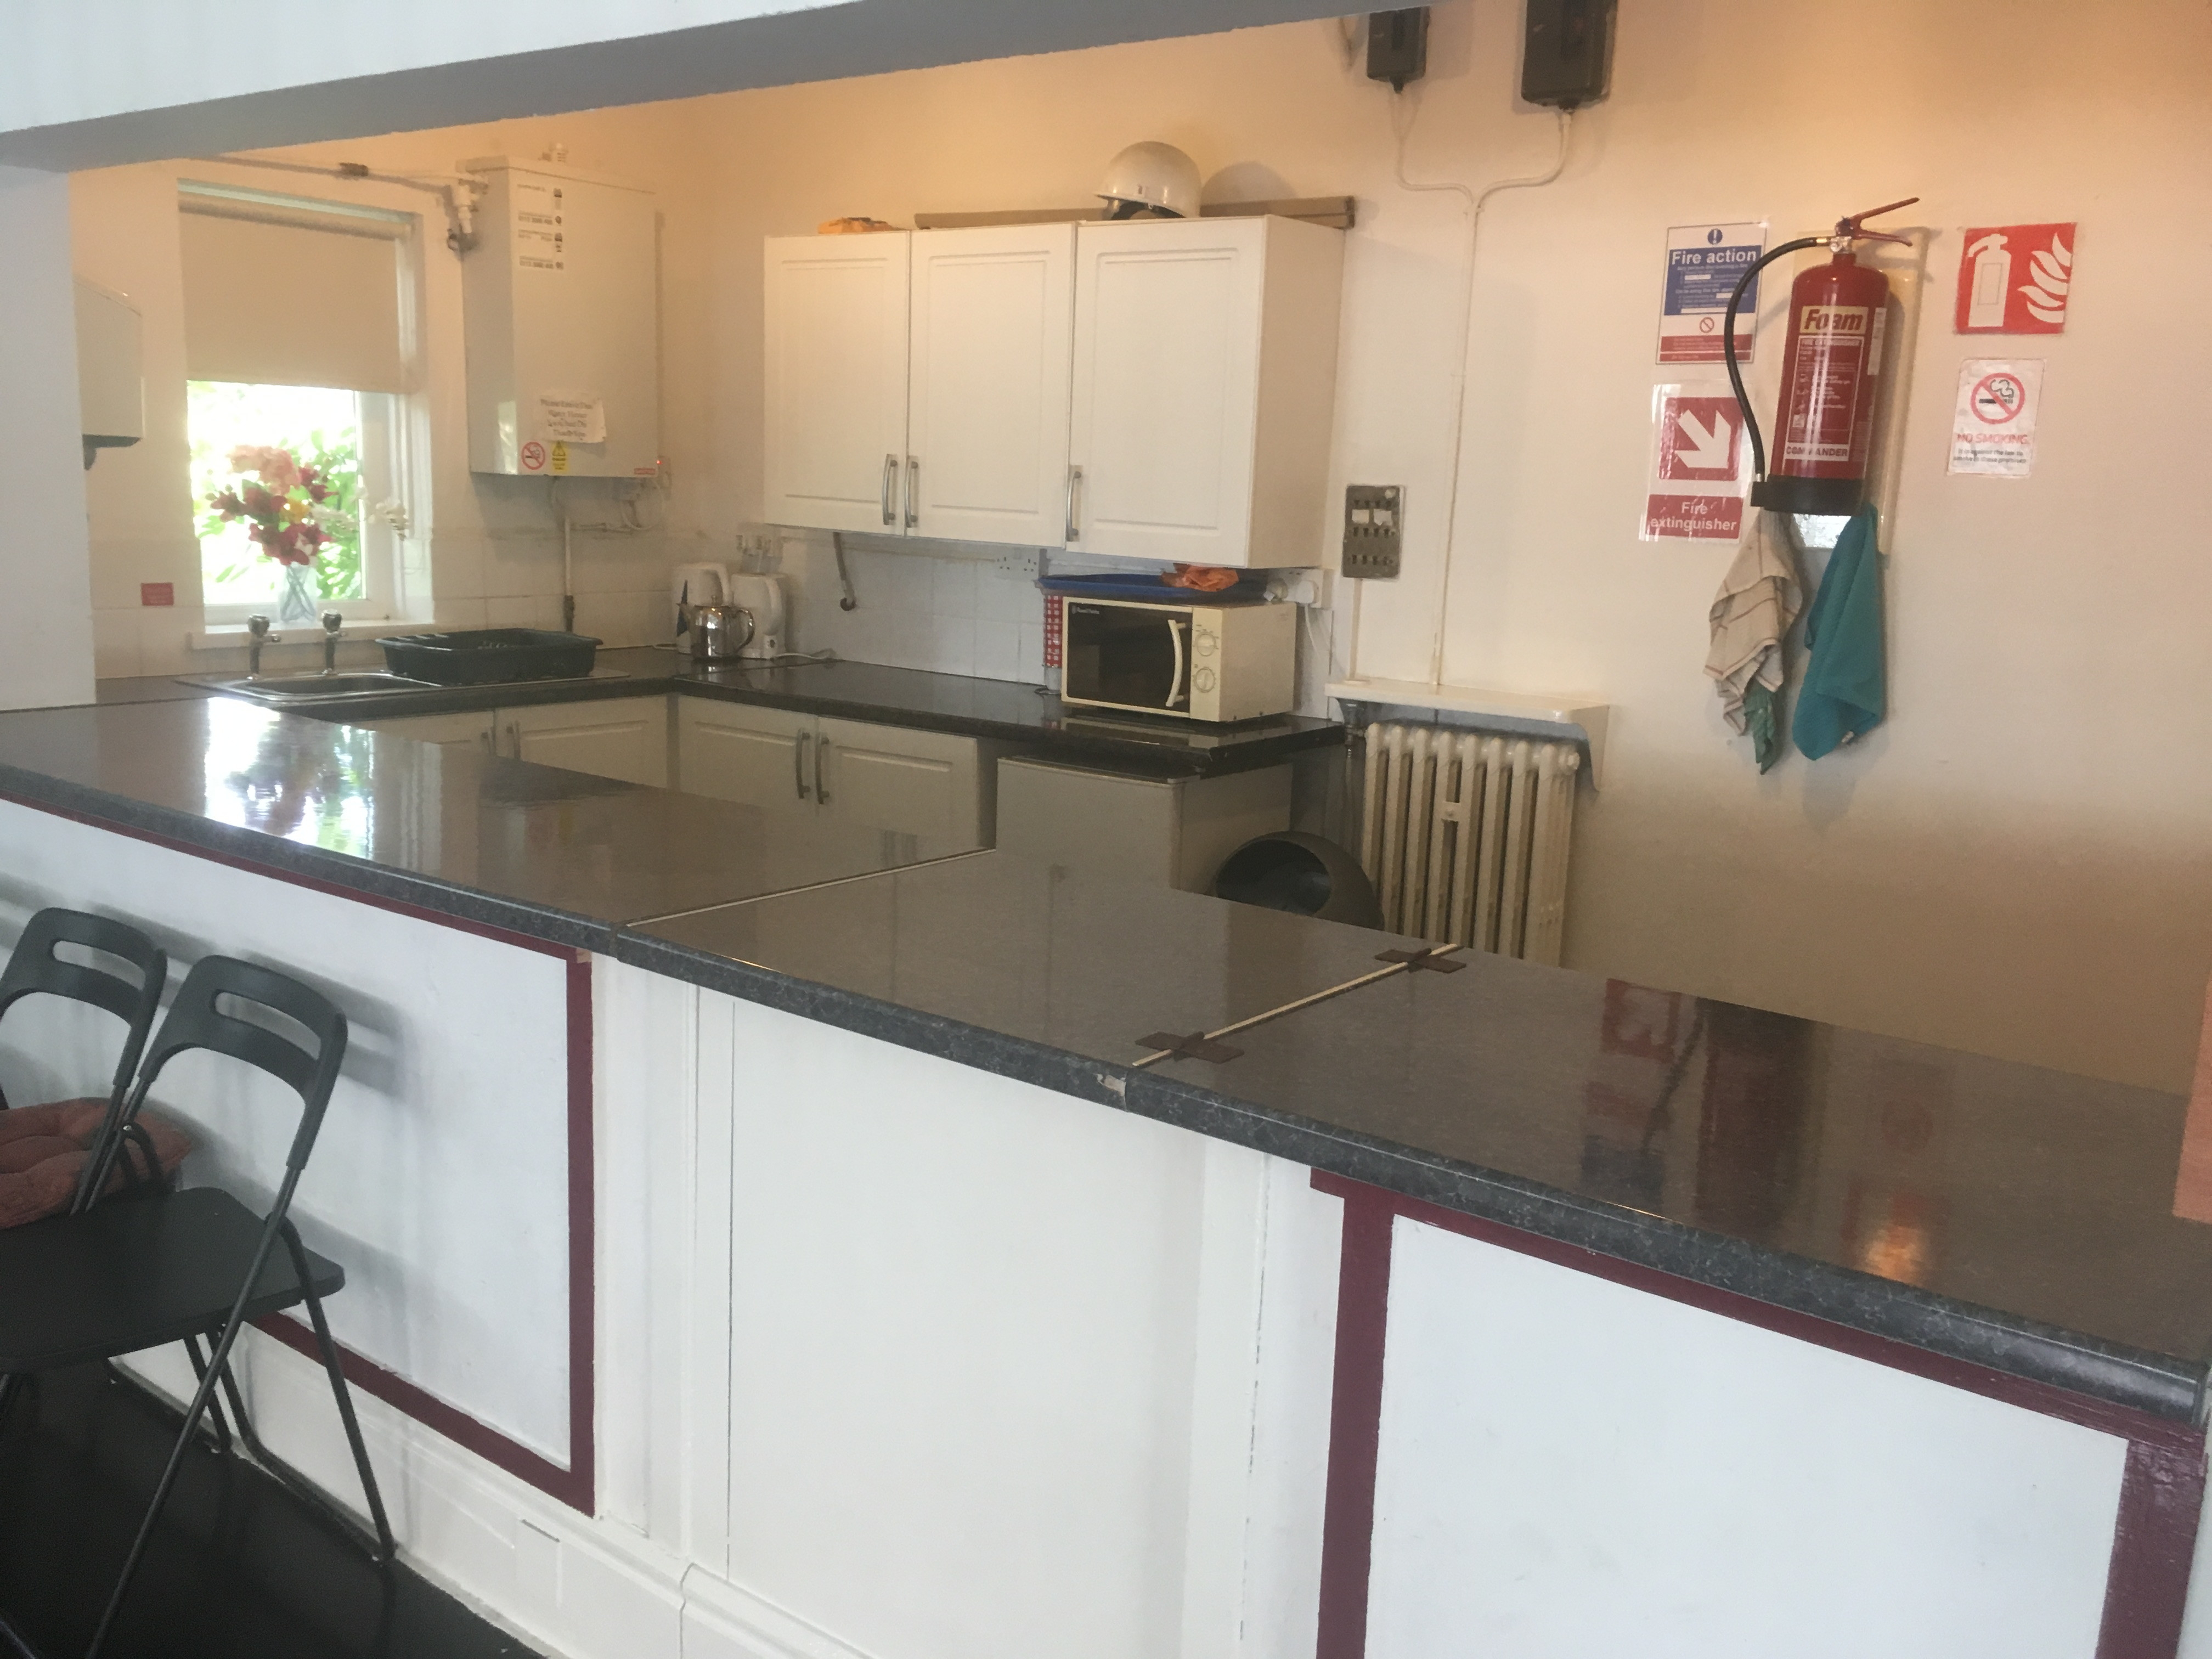 Canteen & Main Kitchen - 1 Hour